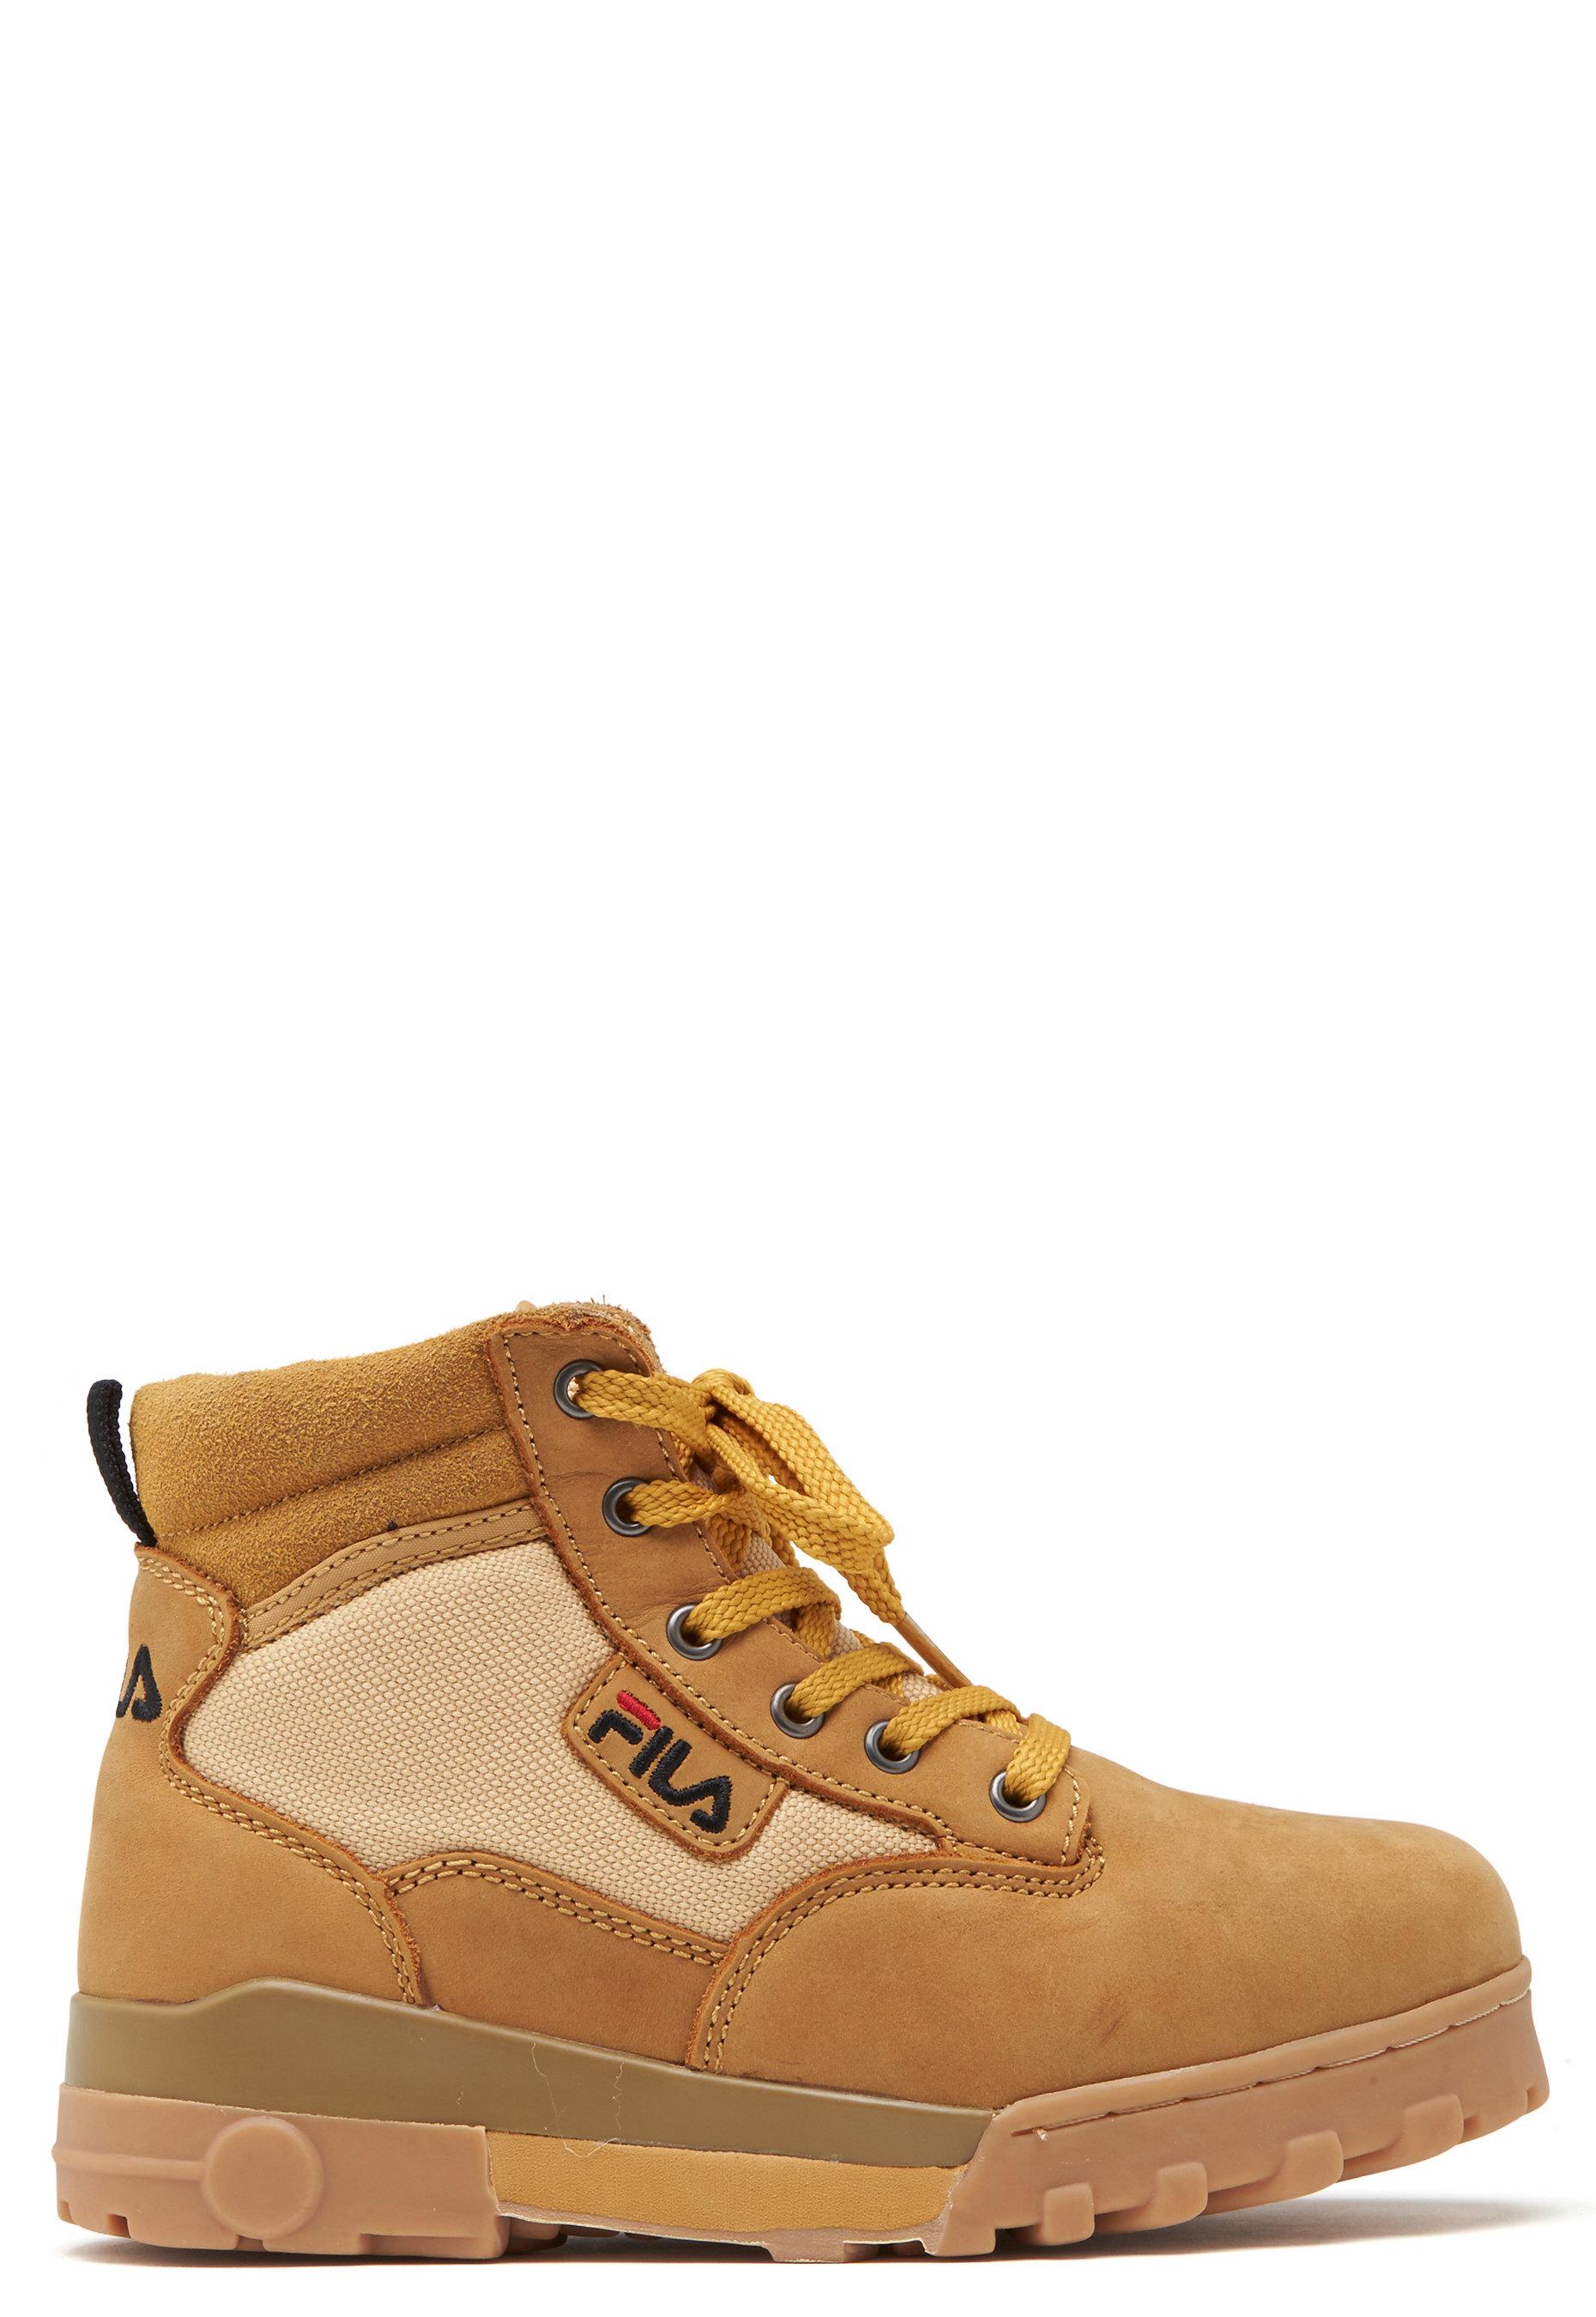 FILA Grunge Mid Wmn Boots Chipmunk Bubbleroom